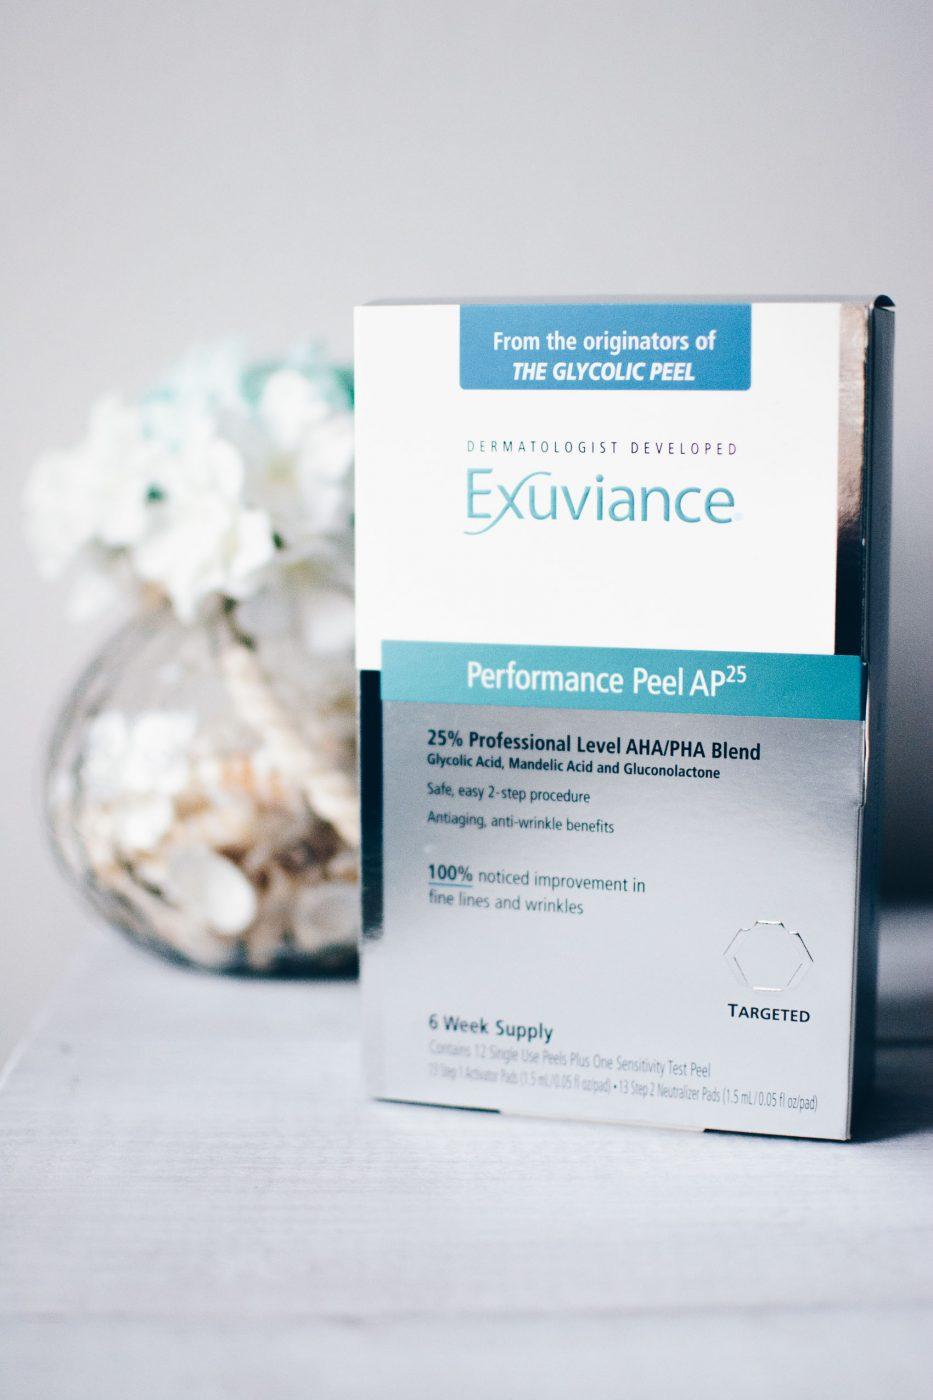 Exuviance Performance Peel